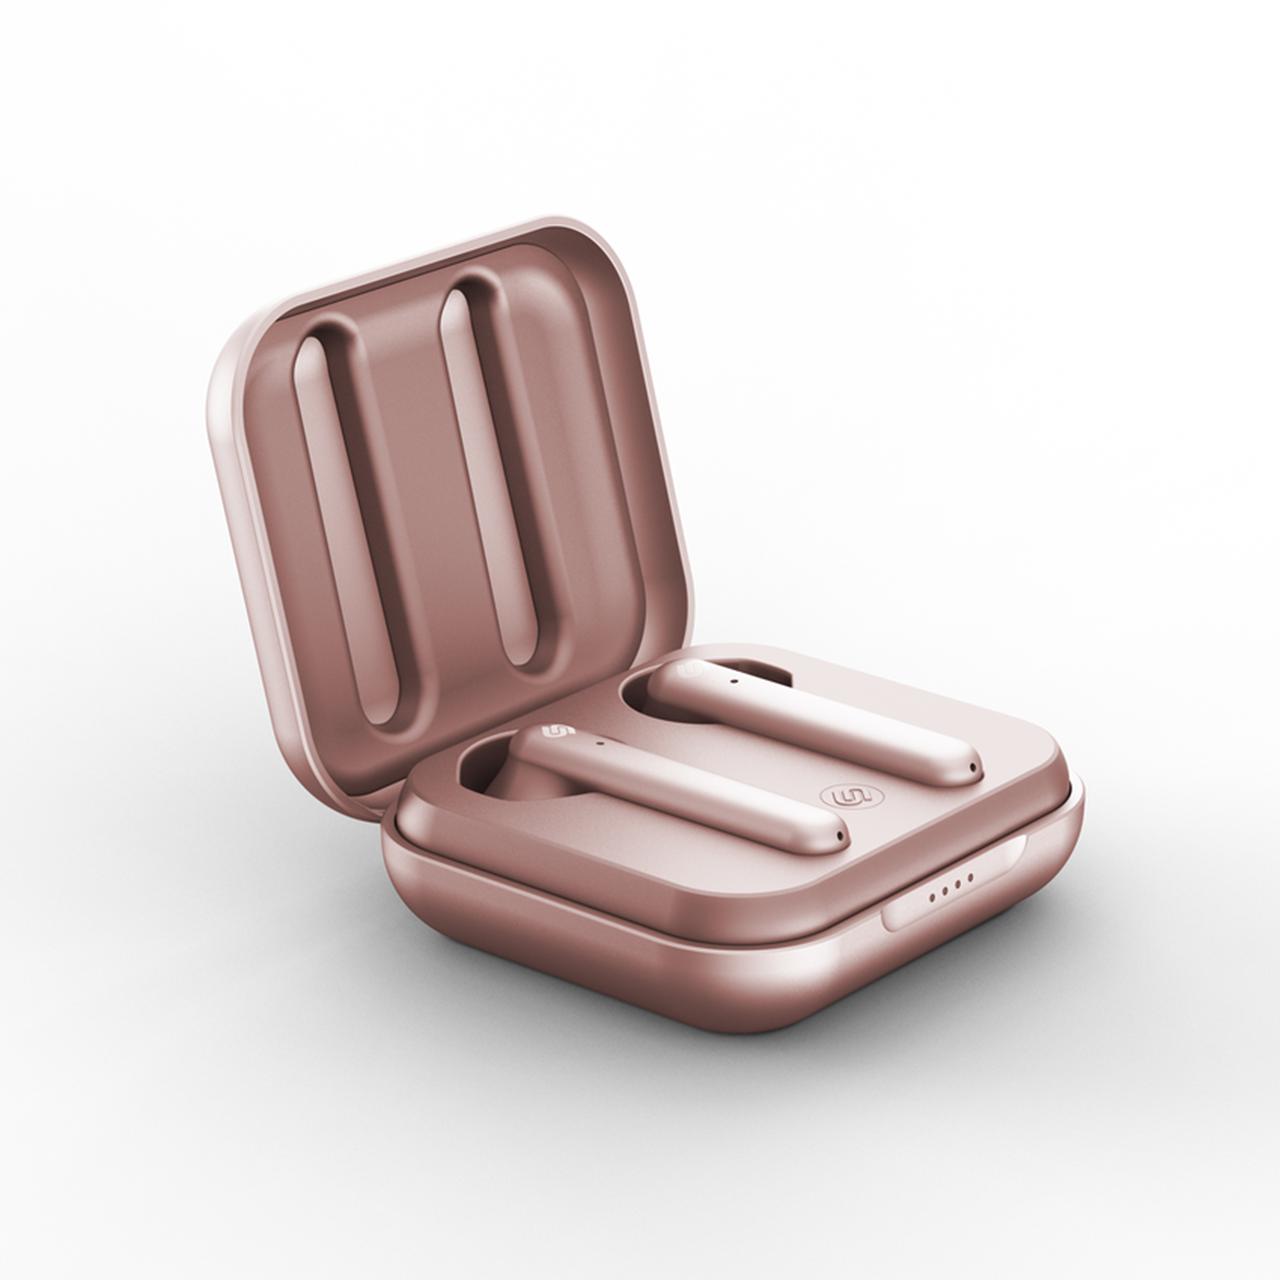 Urbanista Stockholm Plus Rose Gold True Wireless Bluetooth Earphones - 2